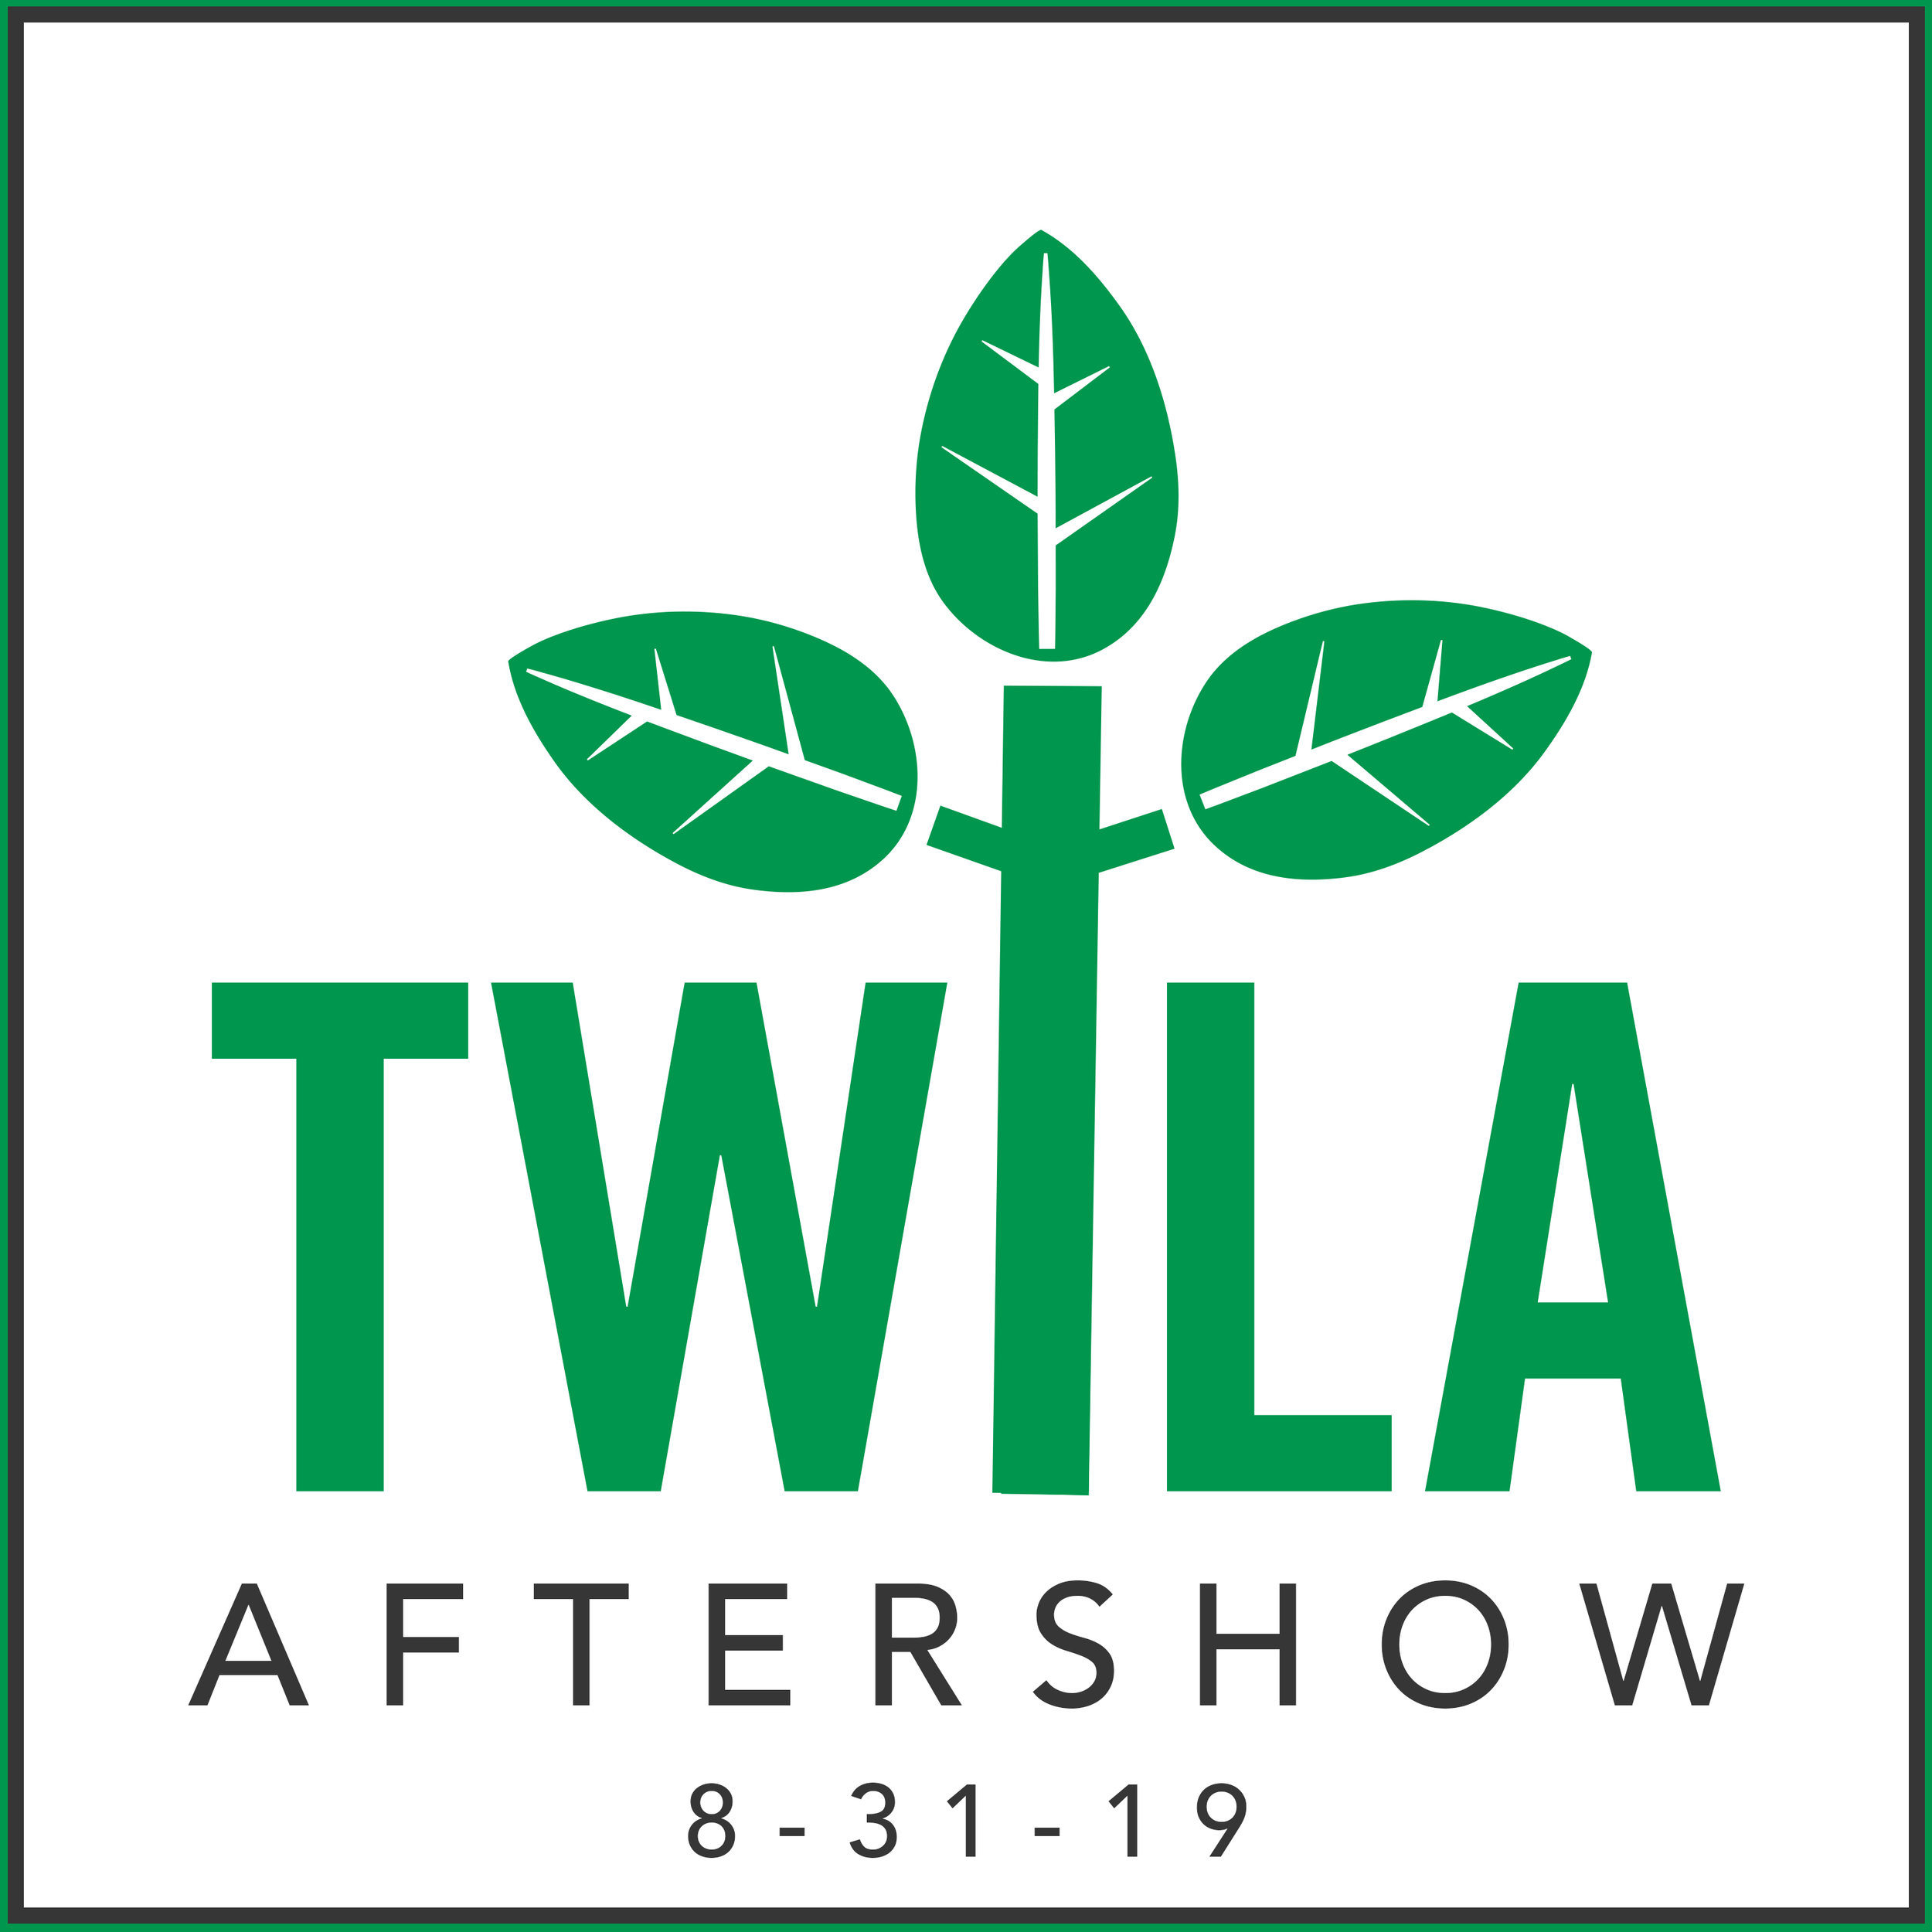 TWILA-After-Show-TN---8-31-19.jpg